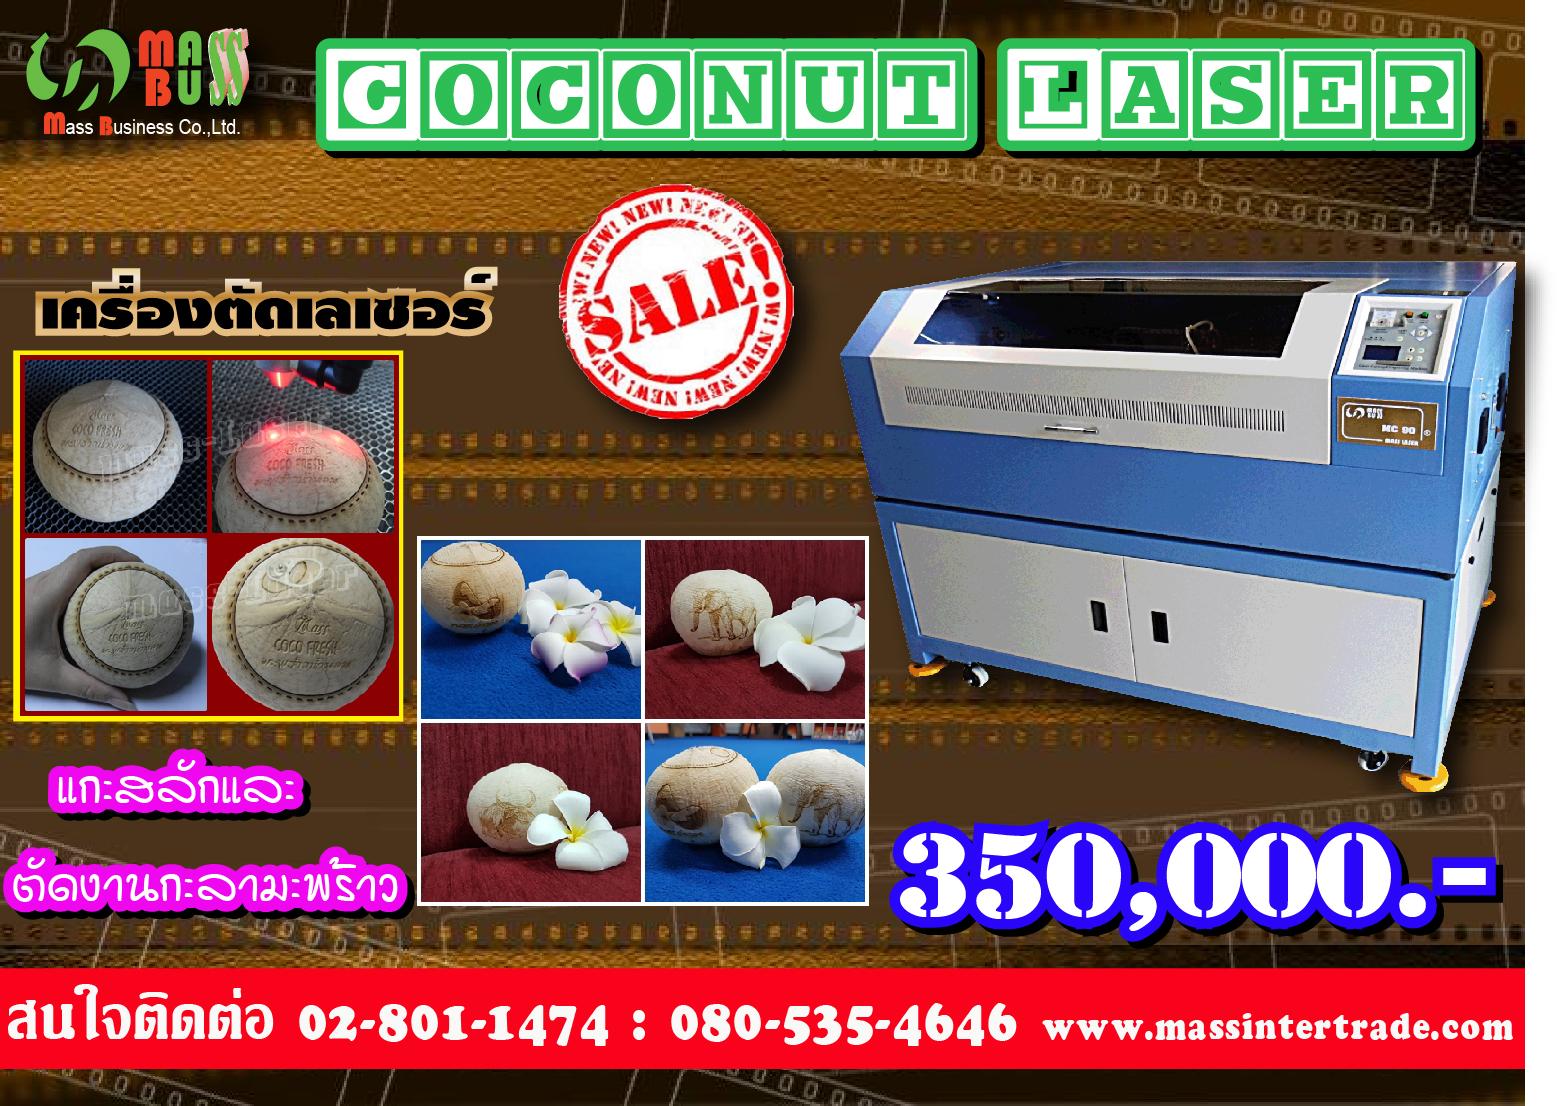 coconut laser